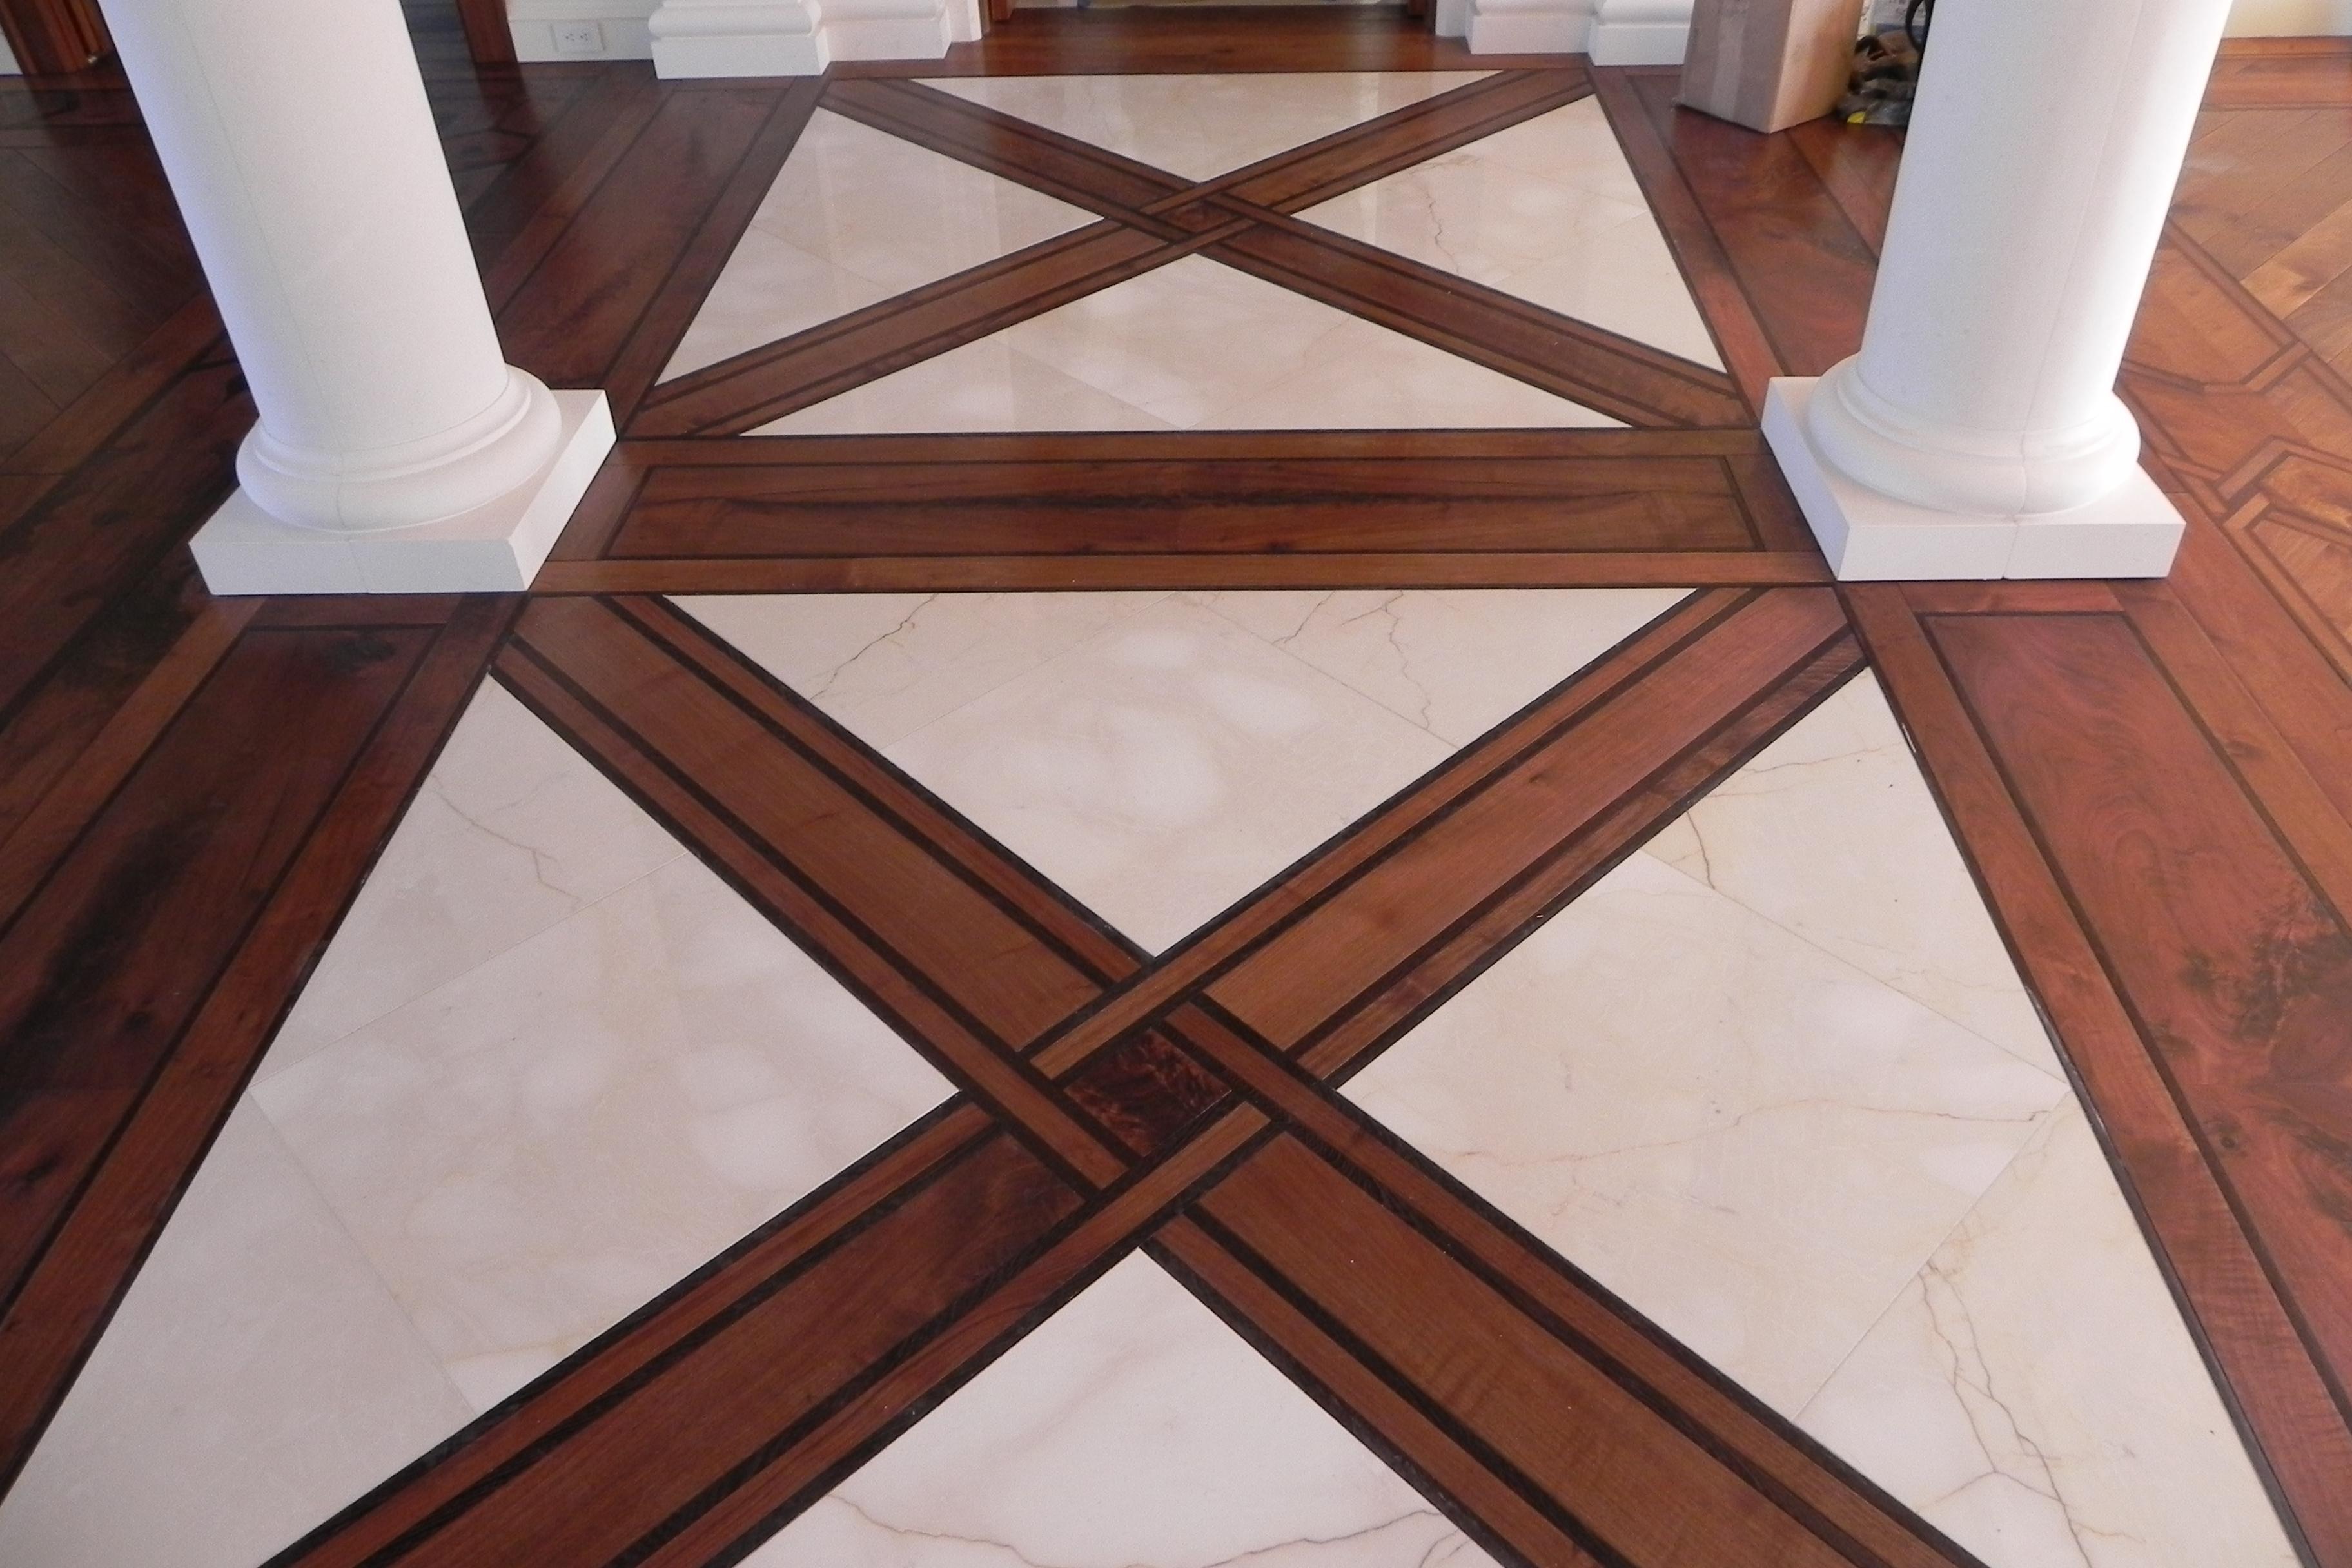 Kitchen Wall Tile Patterns Plank Flooring Legendary Hardwood Floors Llc